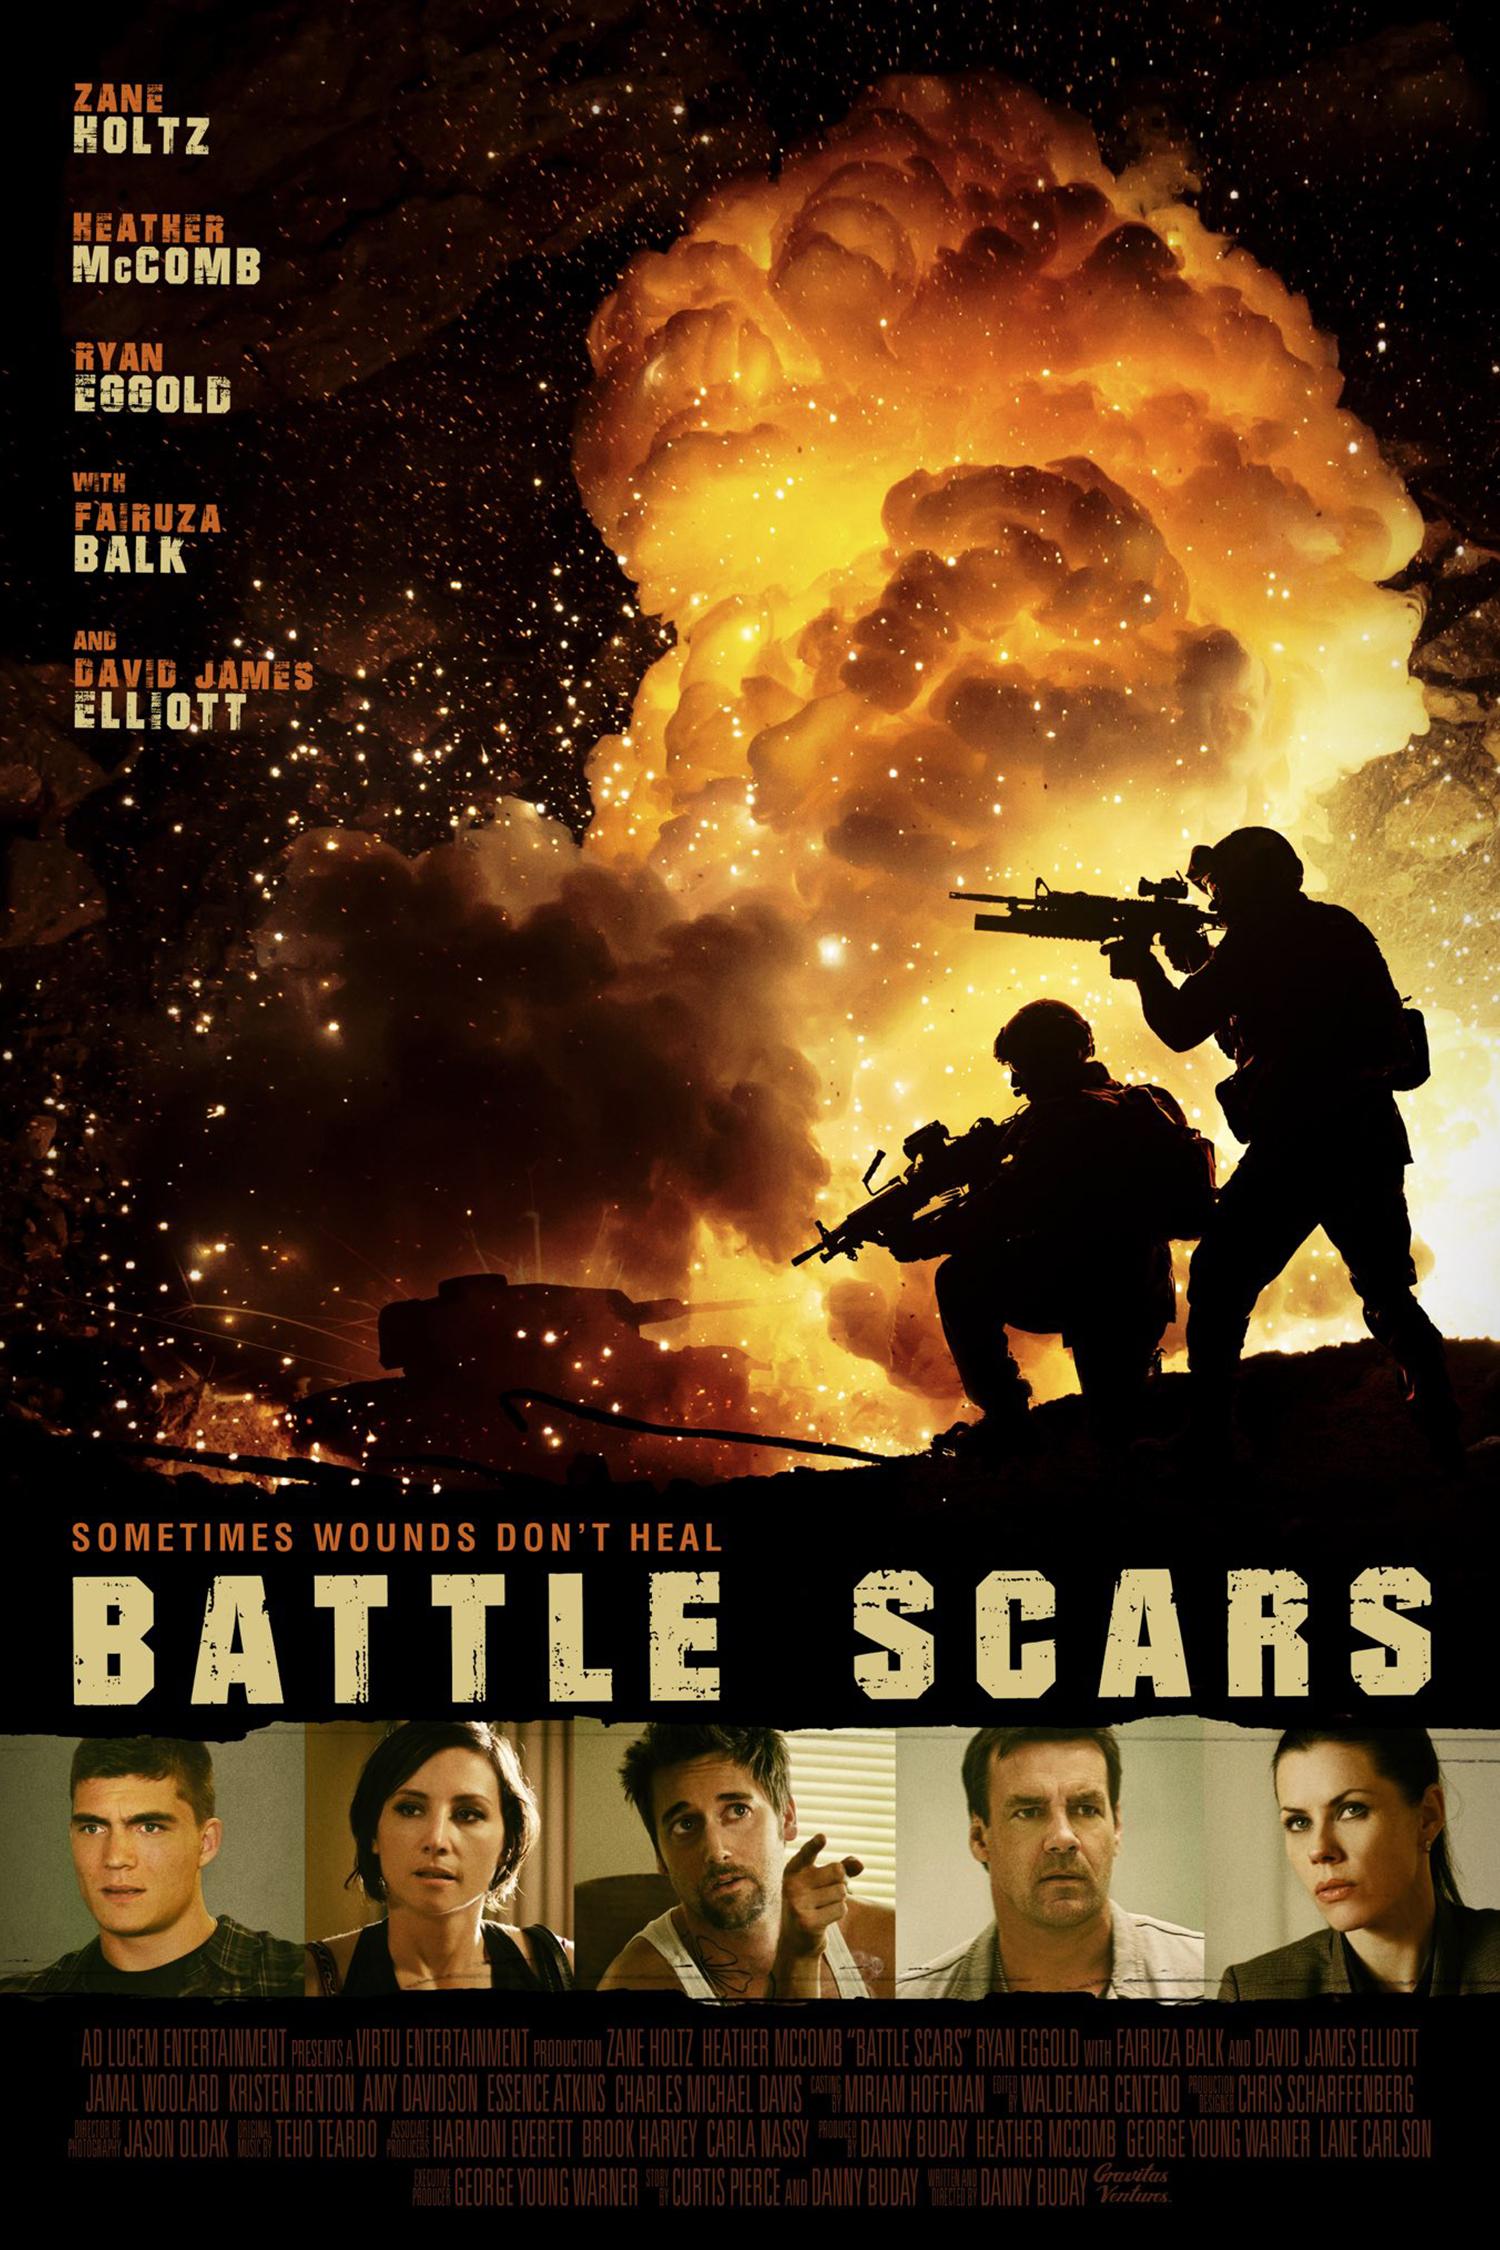 BATTLE SCARS   Feature Film, Drama/War  Gravitas Ventures  Director - Danny Buday  Editor - Waldemar Centeno